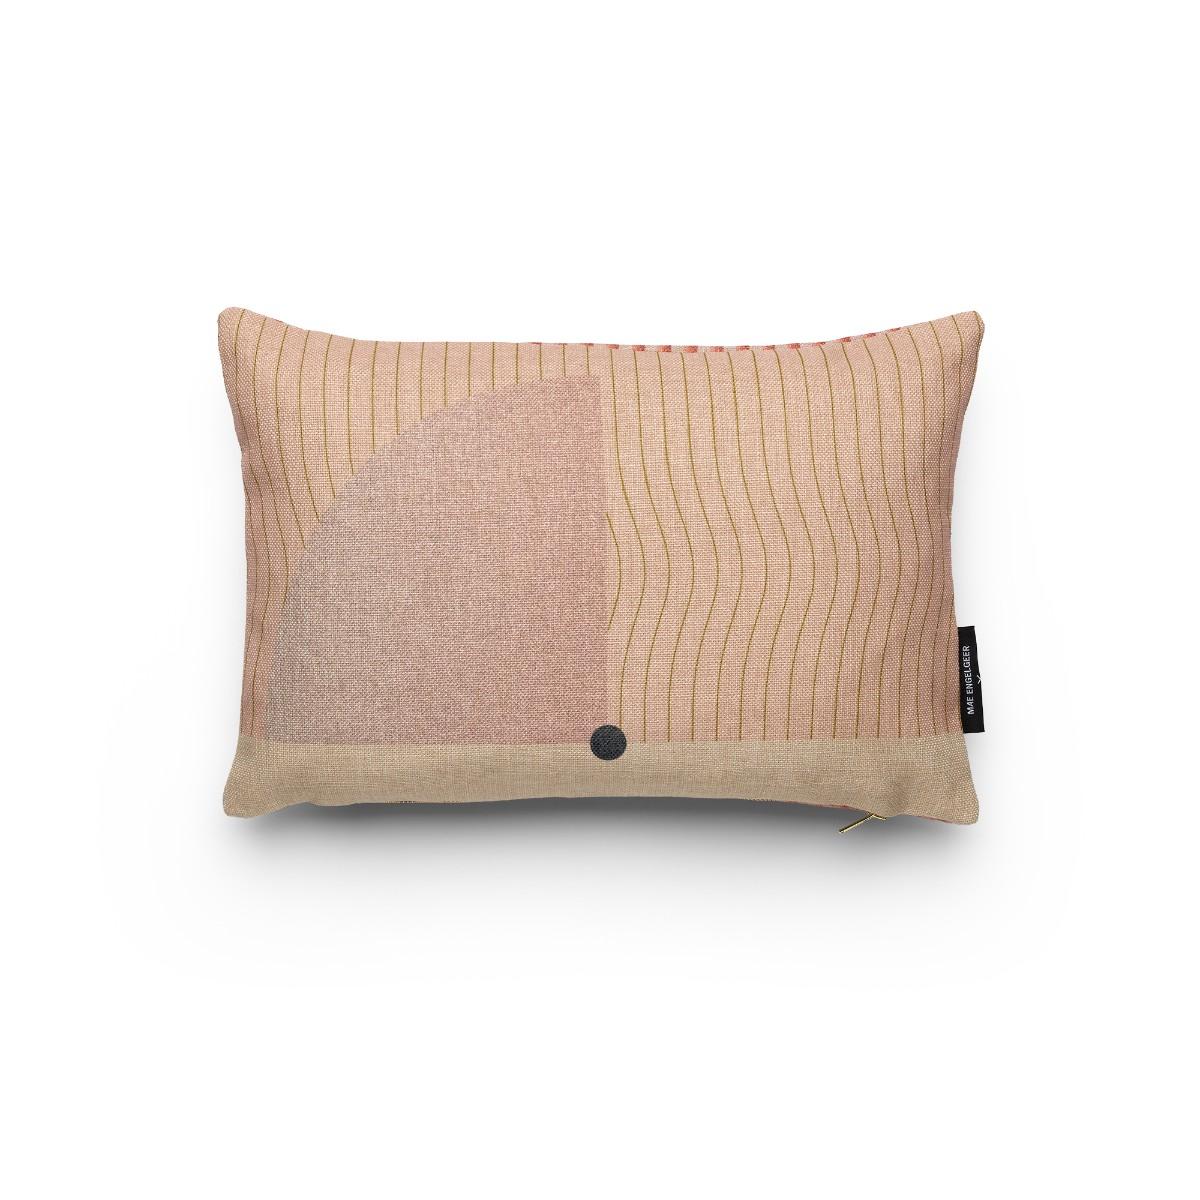 Fest I Dot Cushion (M. ENGELGEER) 45x30cm